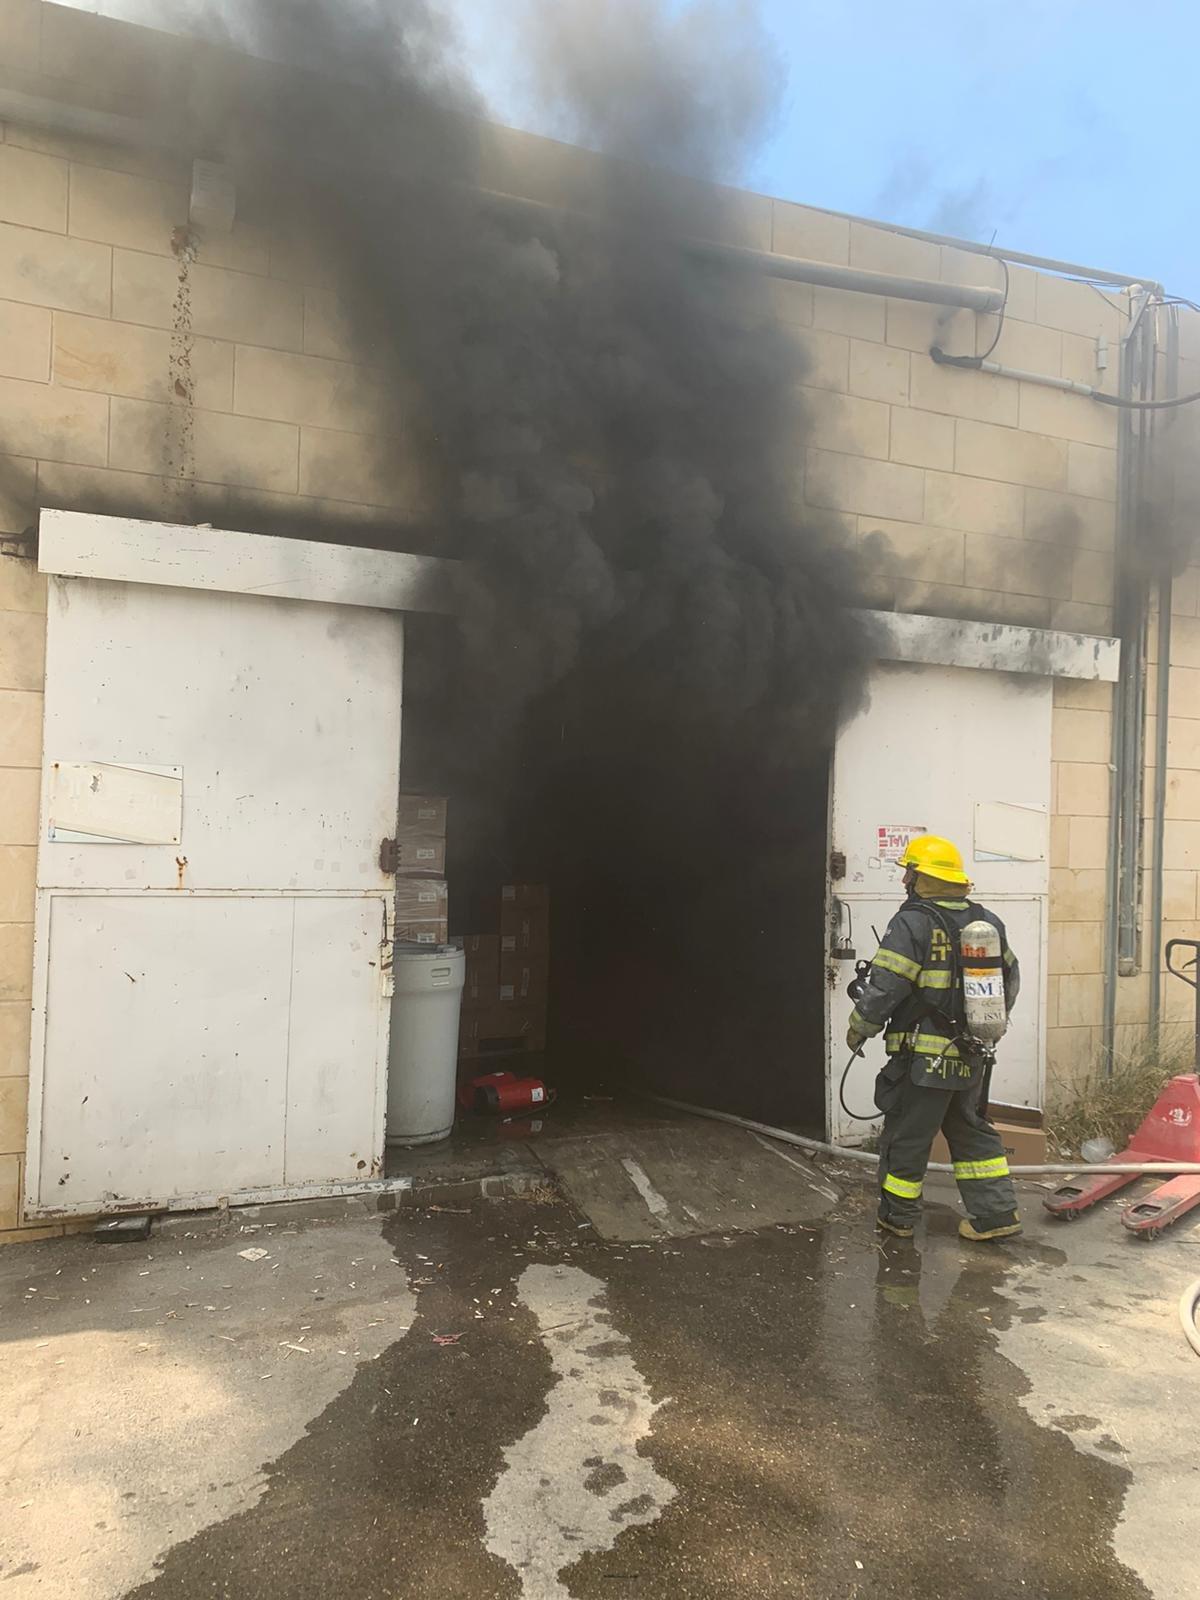 حيفا: نشوب حريق داخل مخزن للكرتون